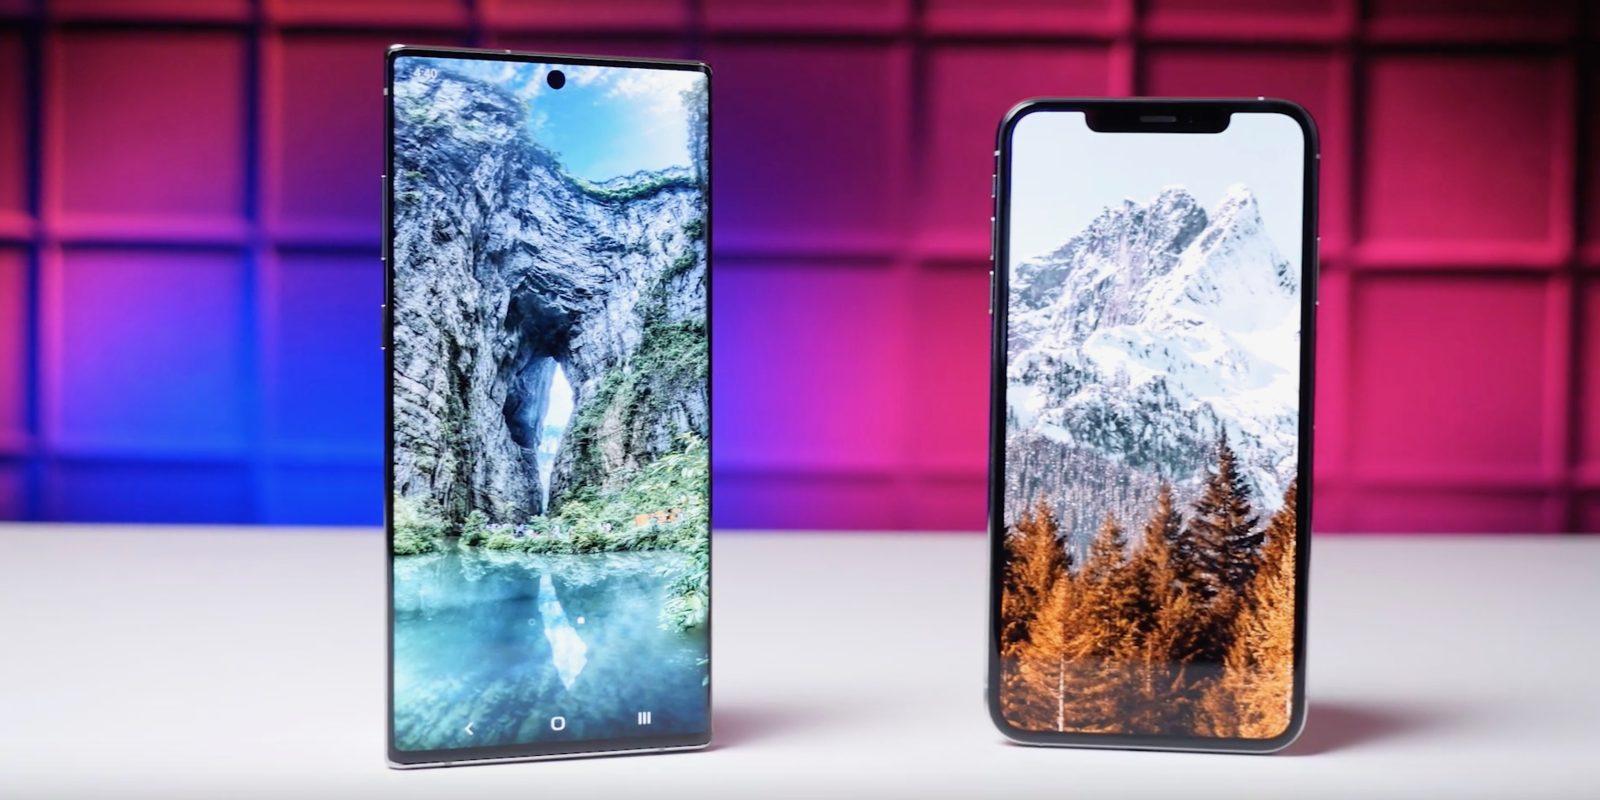 iPhone XS Max ranks behind Samsung Galaxy Note 10+ ahead of